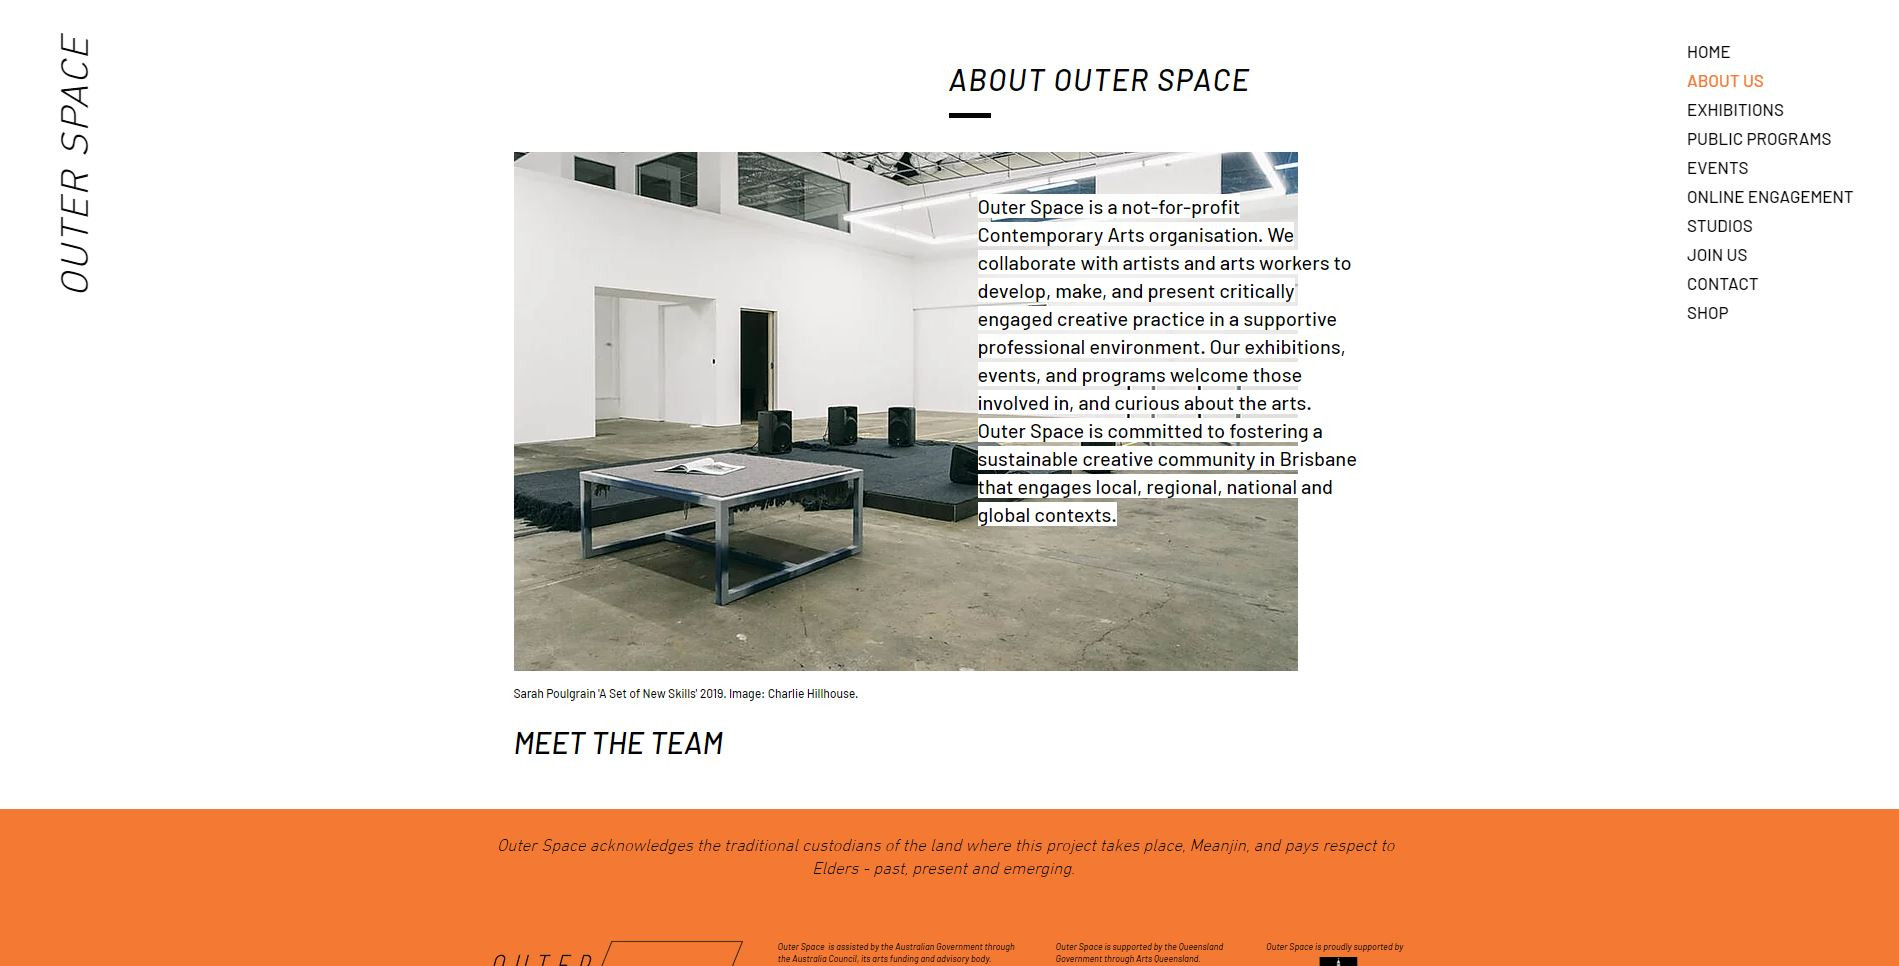 Outer Space About_Website Screenshot.JPG